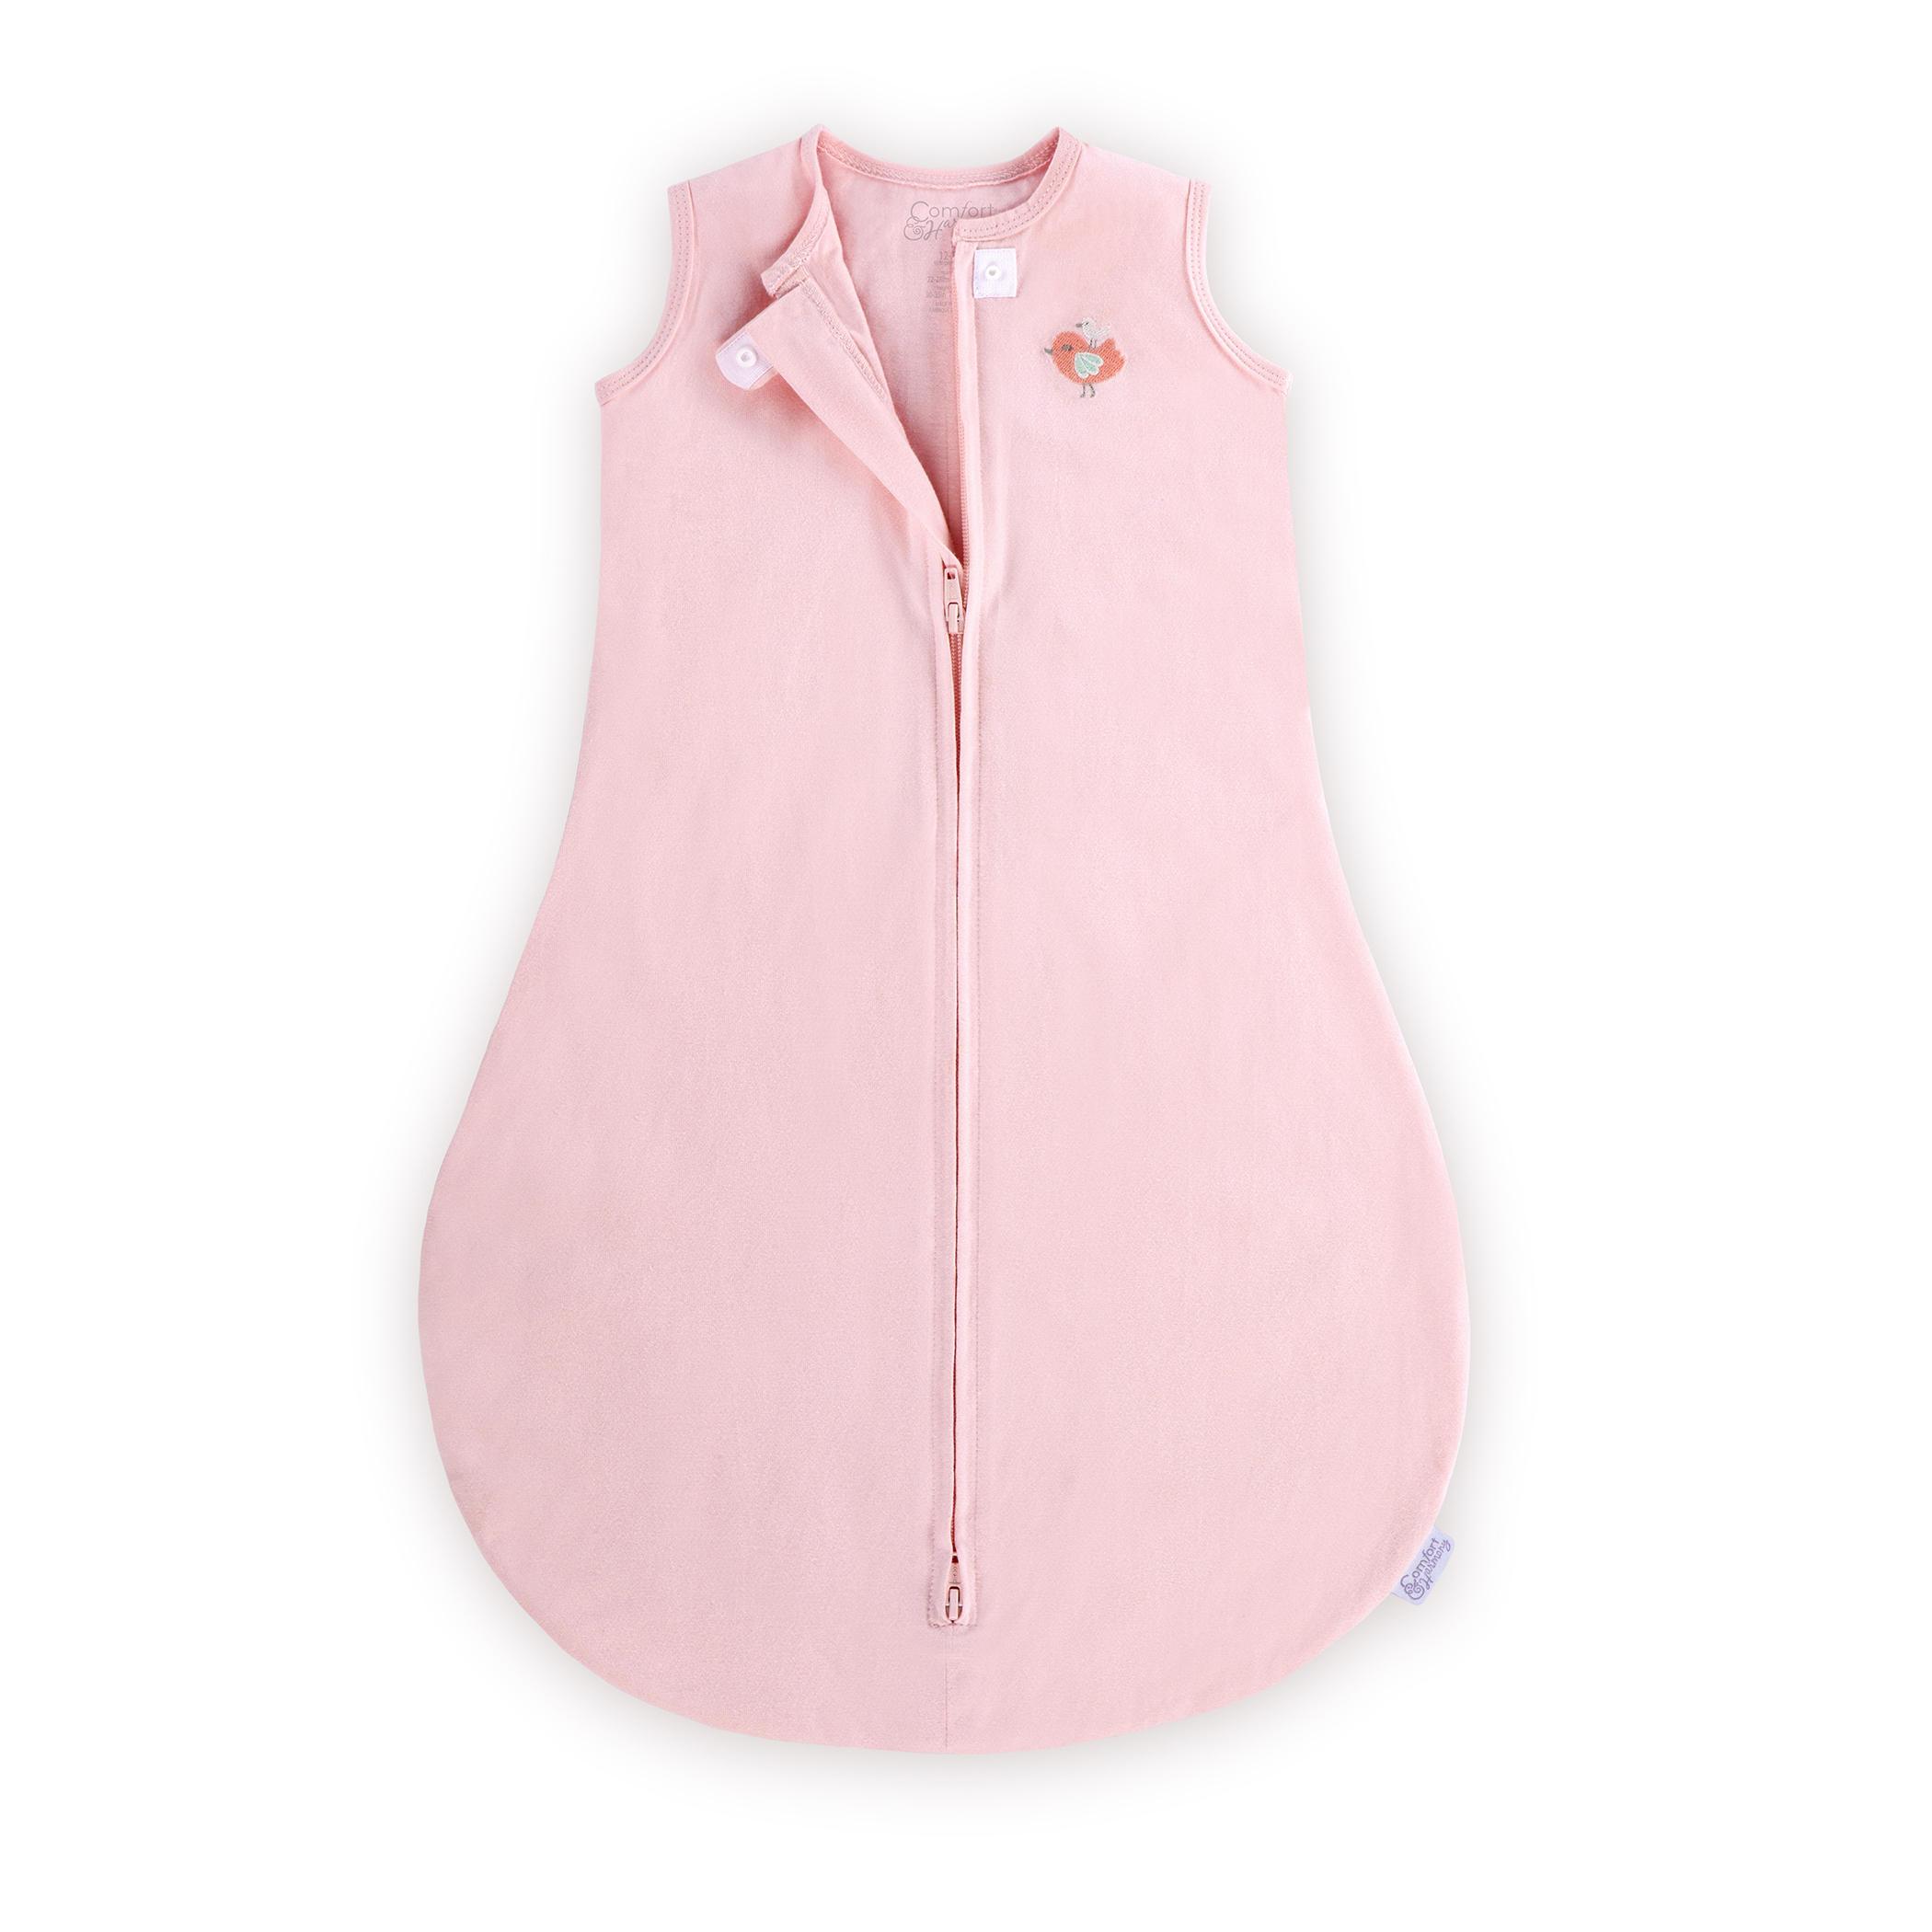 Peanut Sleeping Bag™ - Sweet Tweets™ - Small